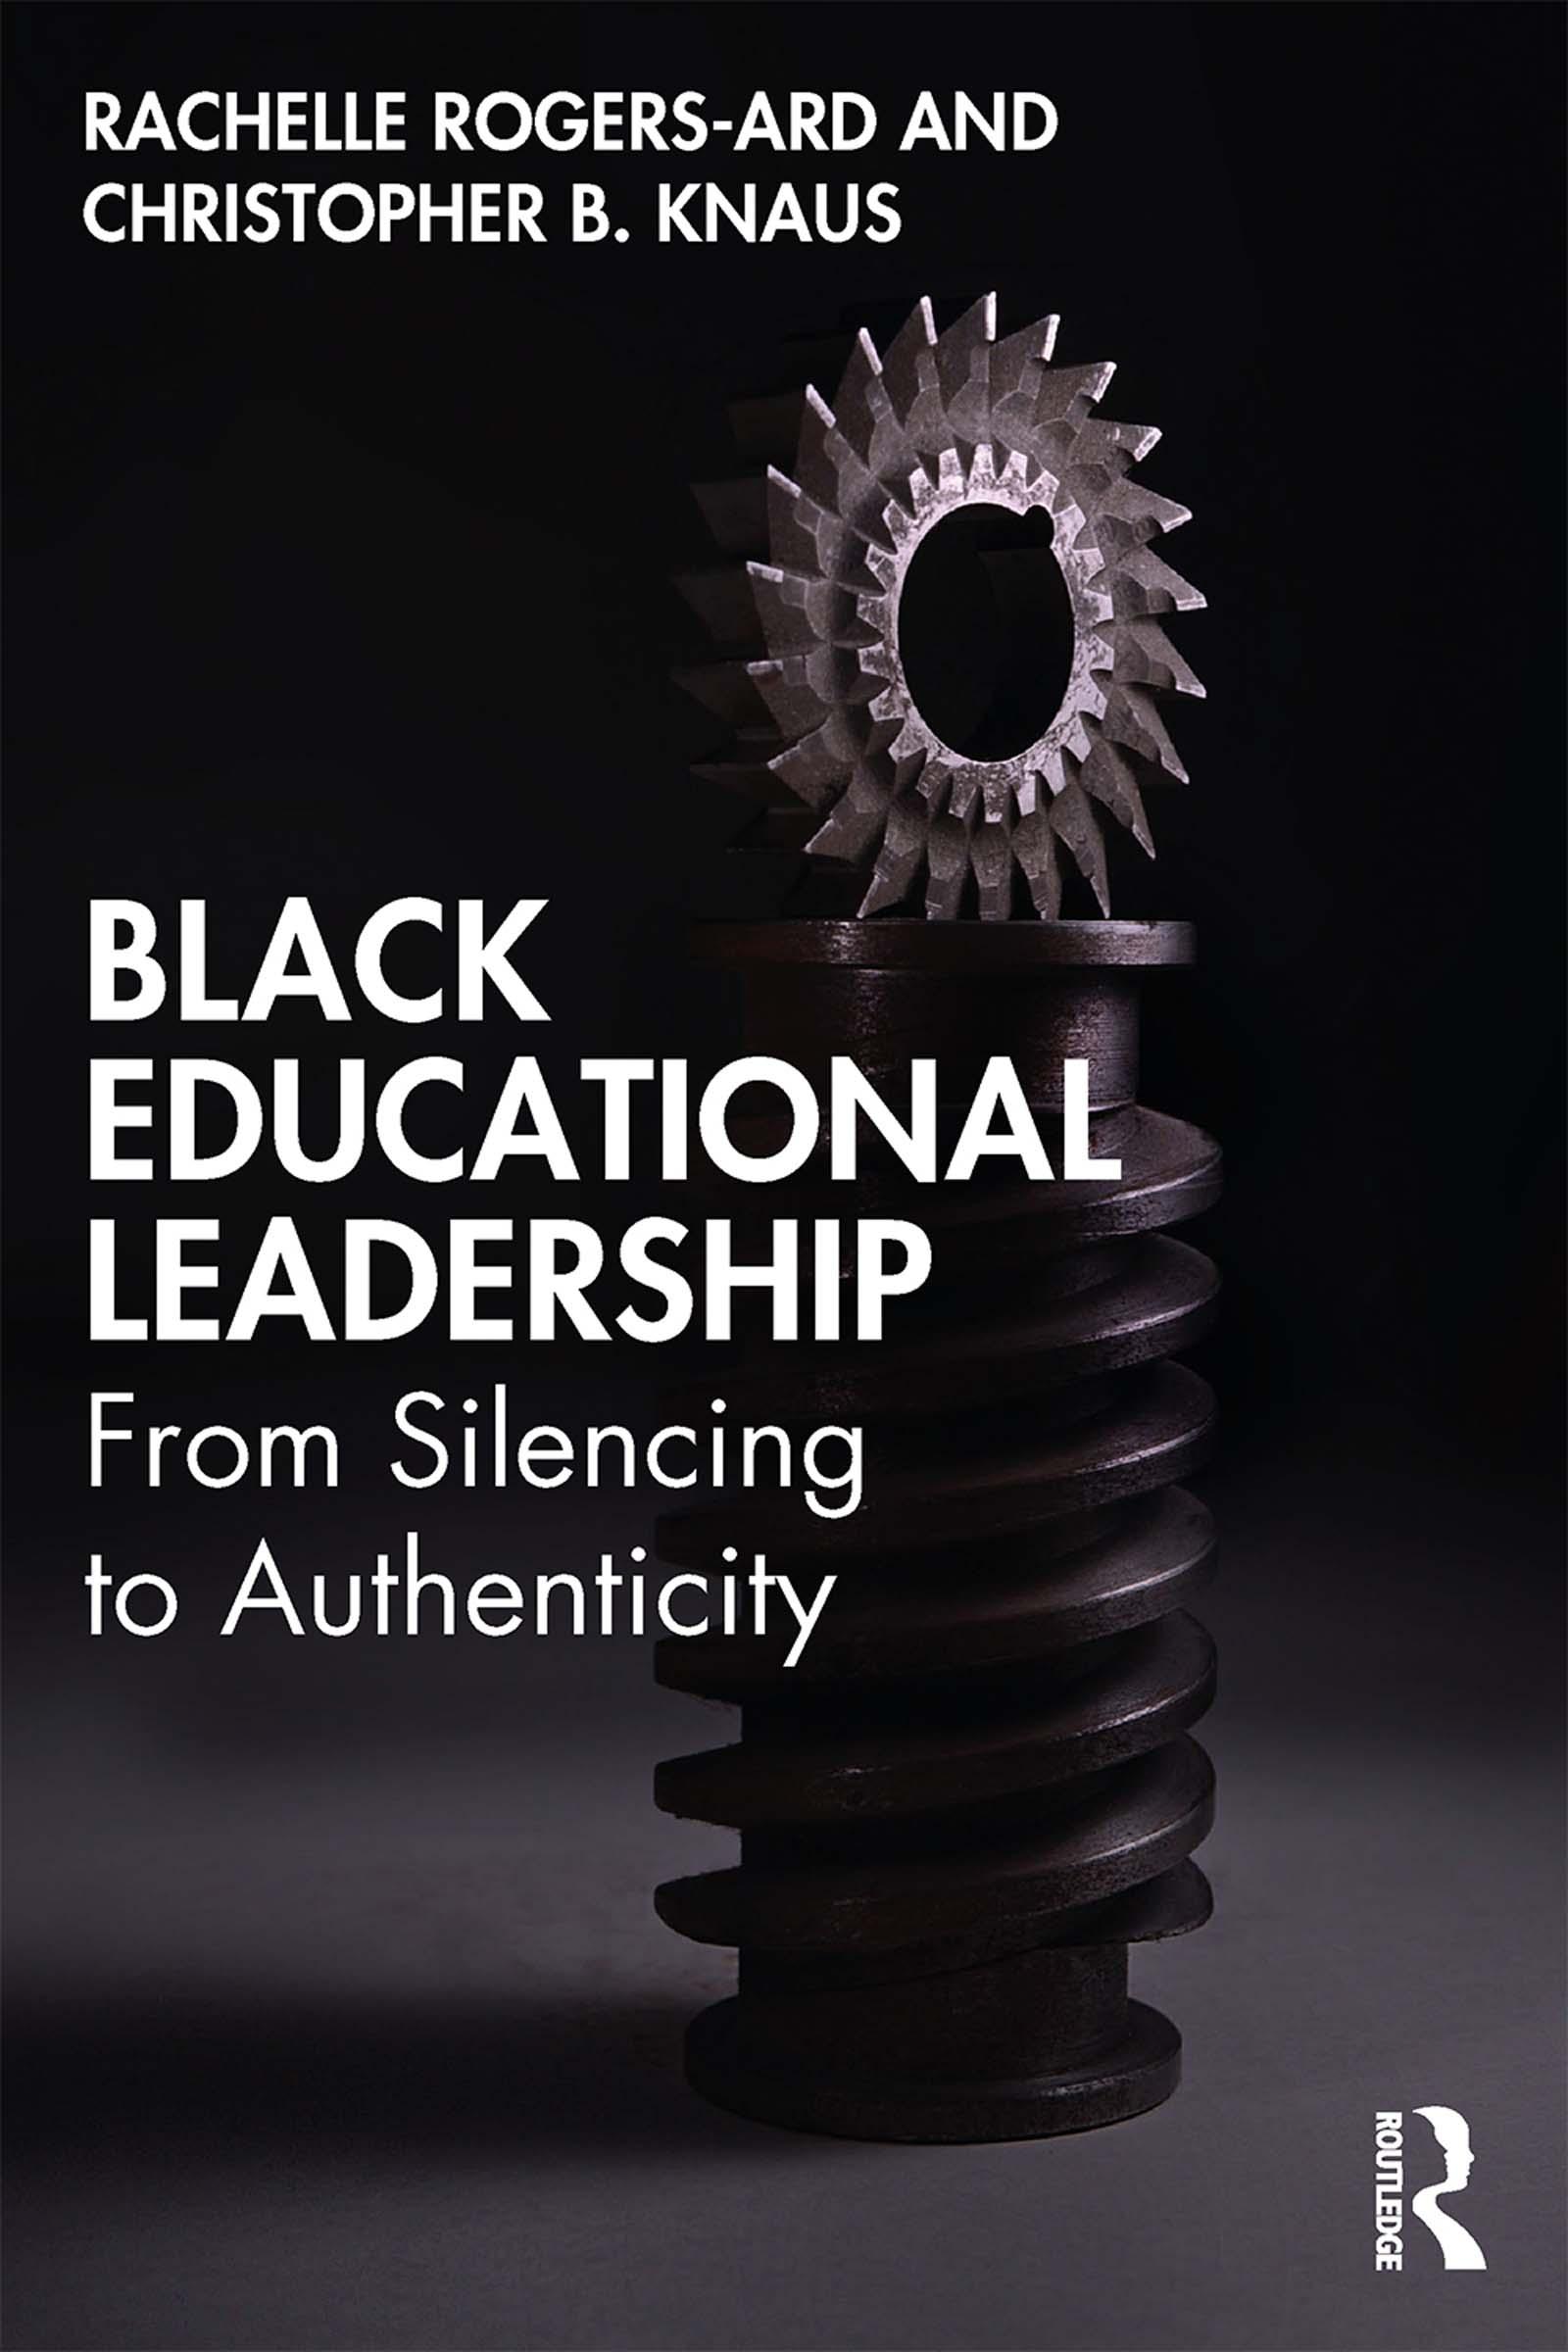 Black Educational Leadership